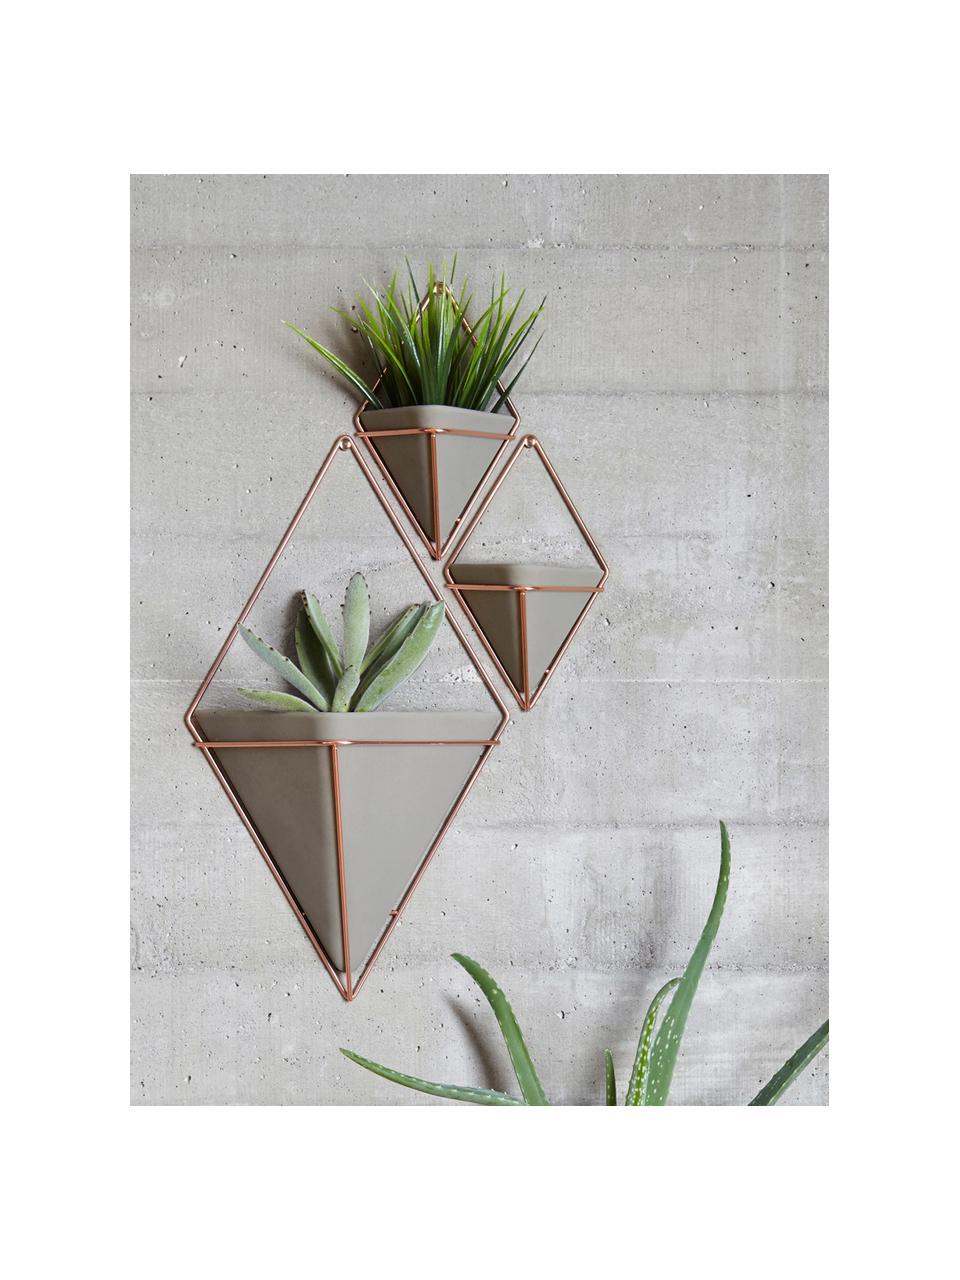 Wandaufbewahrungs-Schale Trigg aus Beton, Aufbewahrung: Beton, Grau, Kupfer matt, 22 x 38 cm